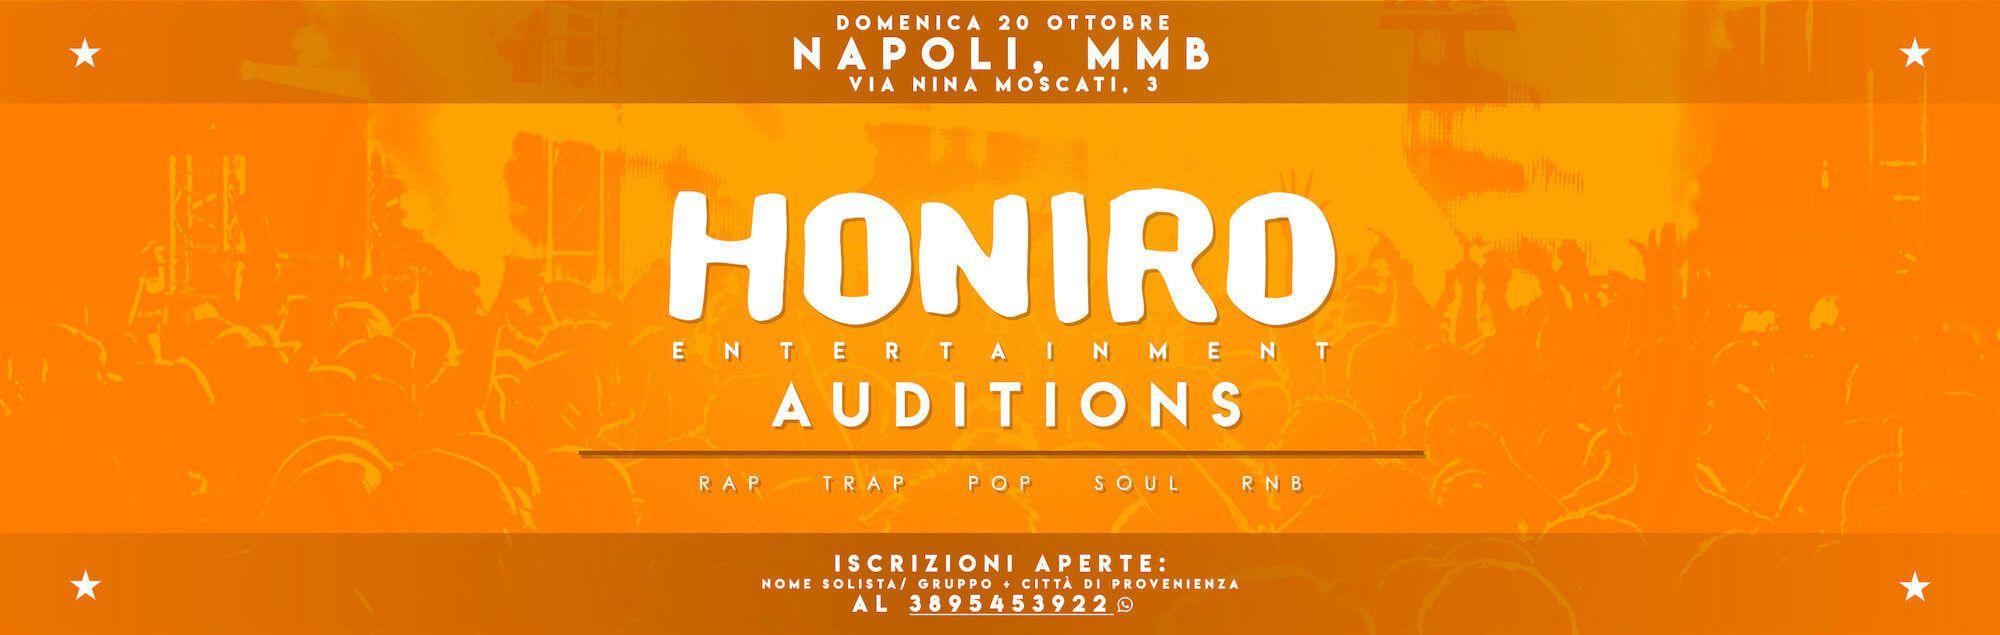 banner-honiro-auditions